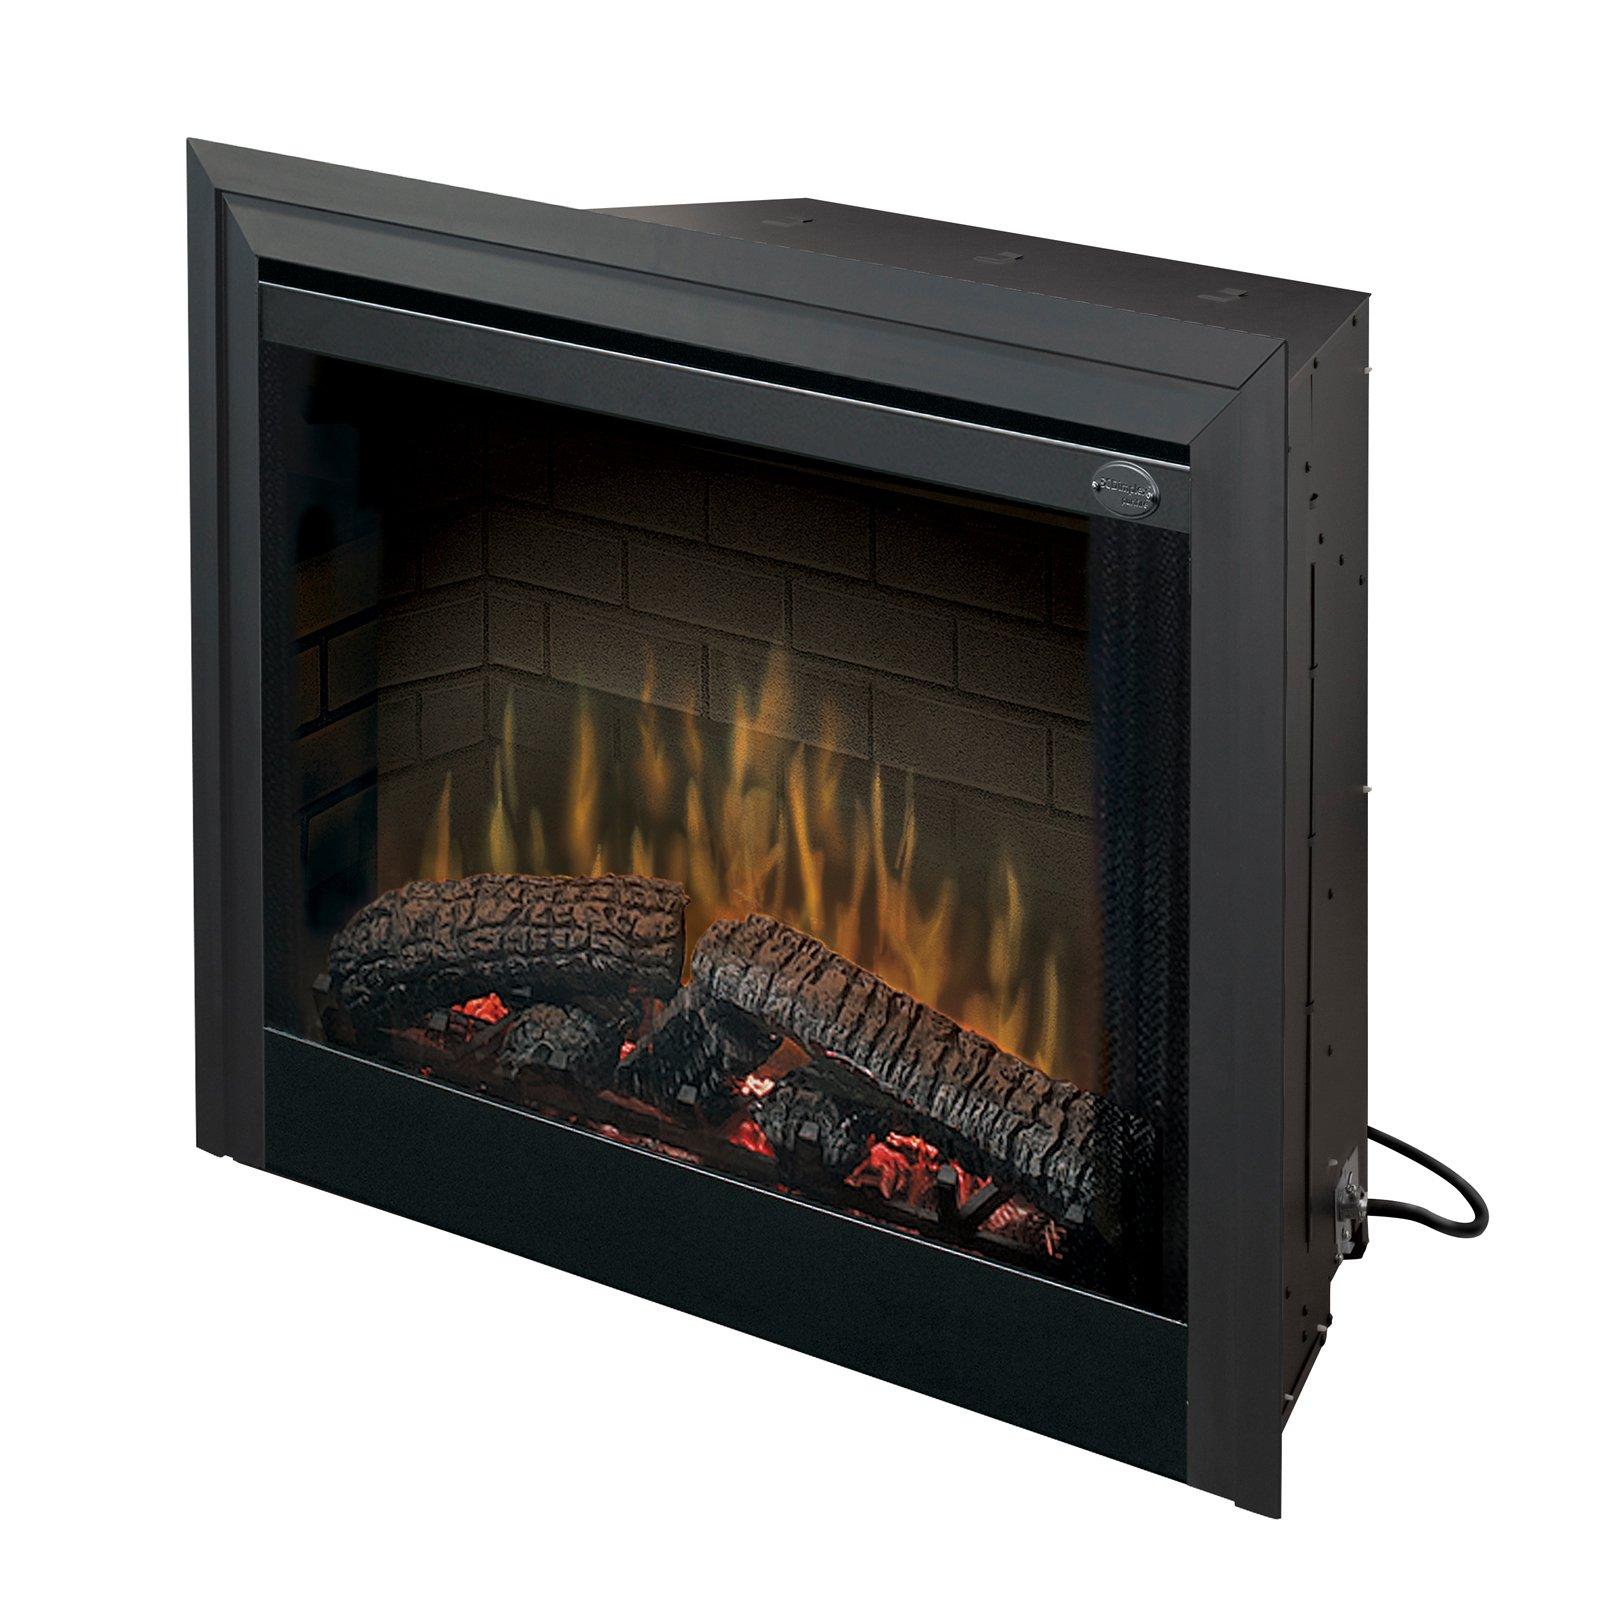 Dimplex 39 in. Standard Built-In Electric Fireplace Insert